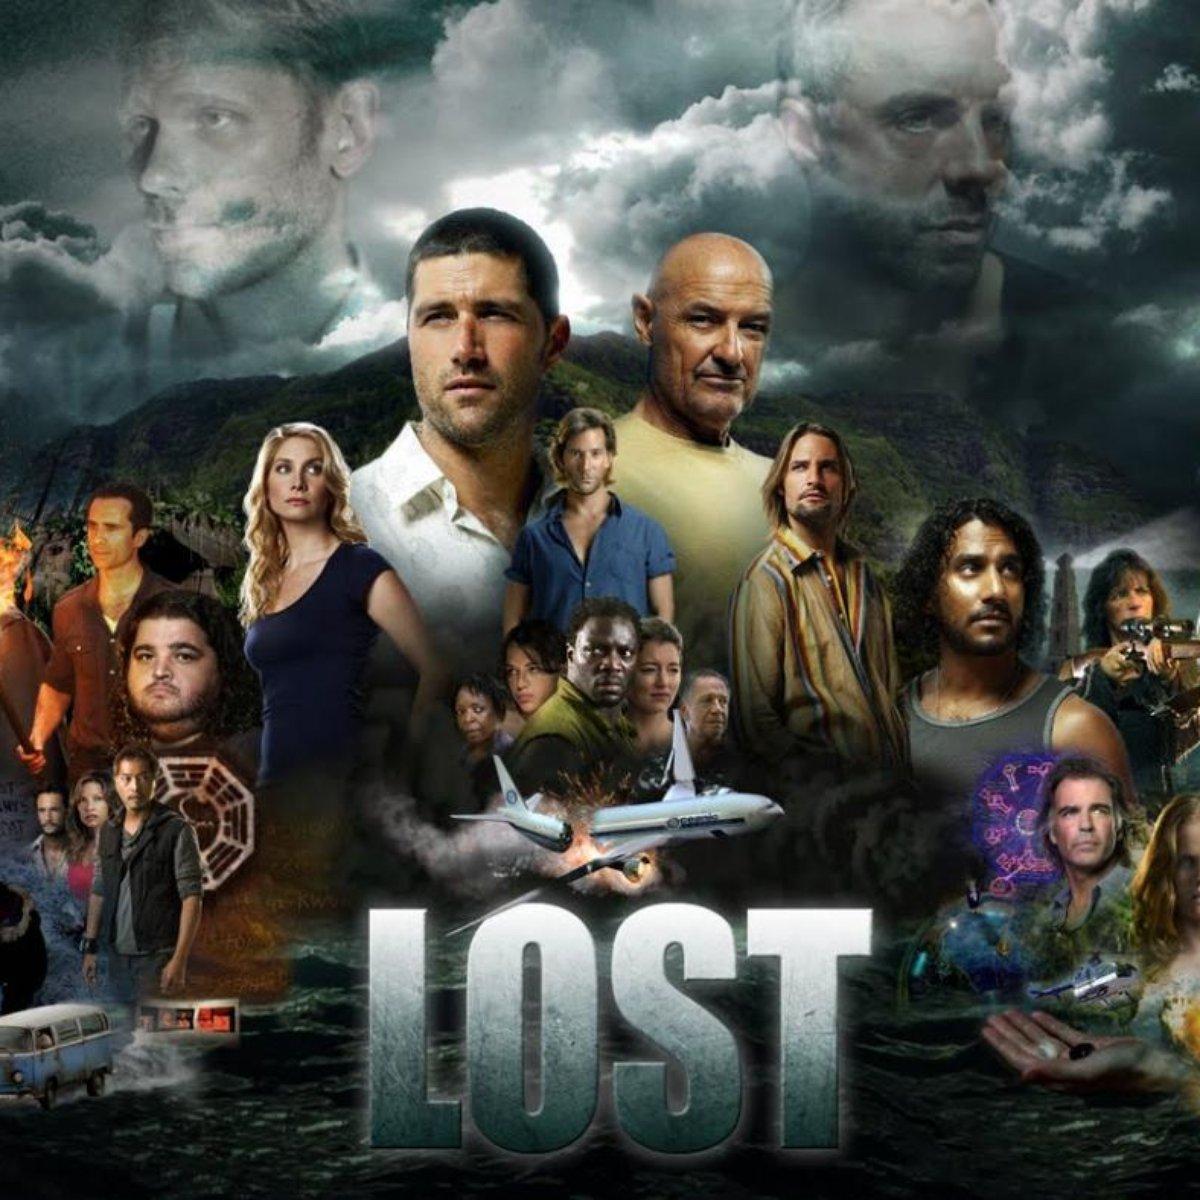 lost-series